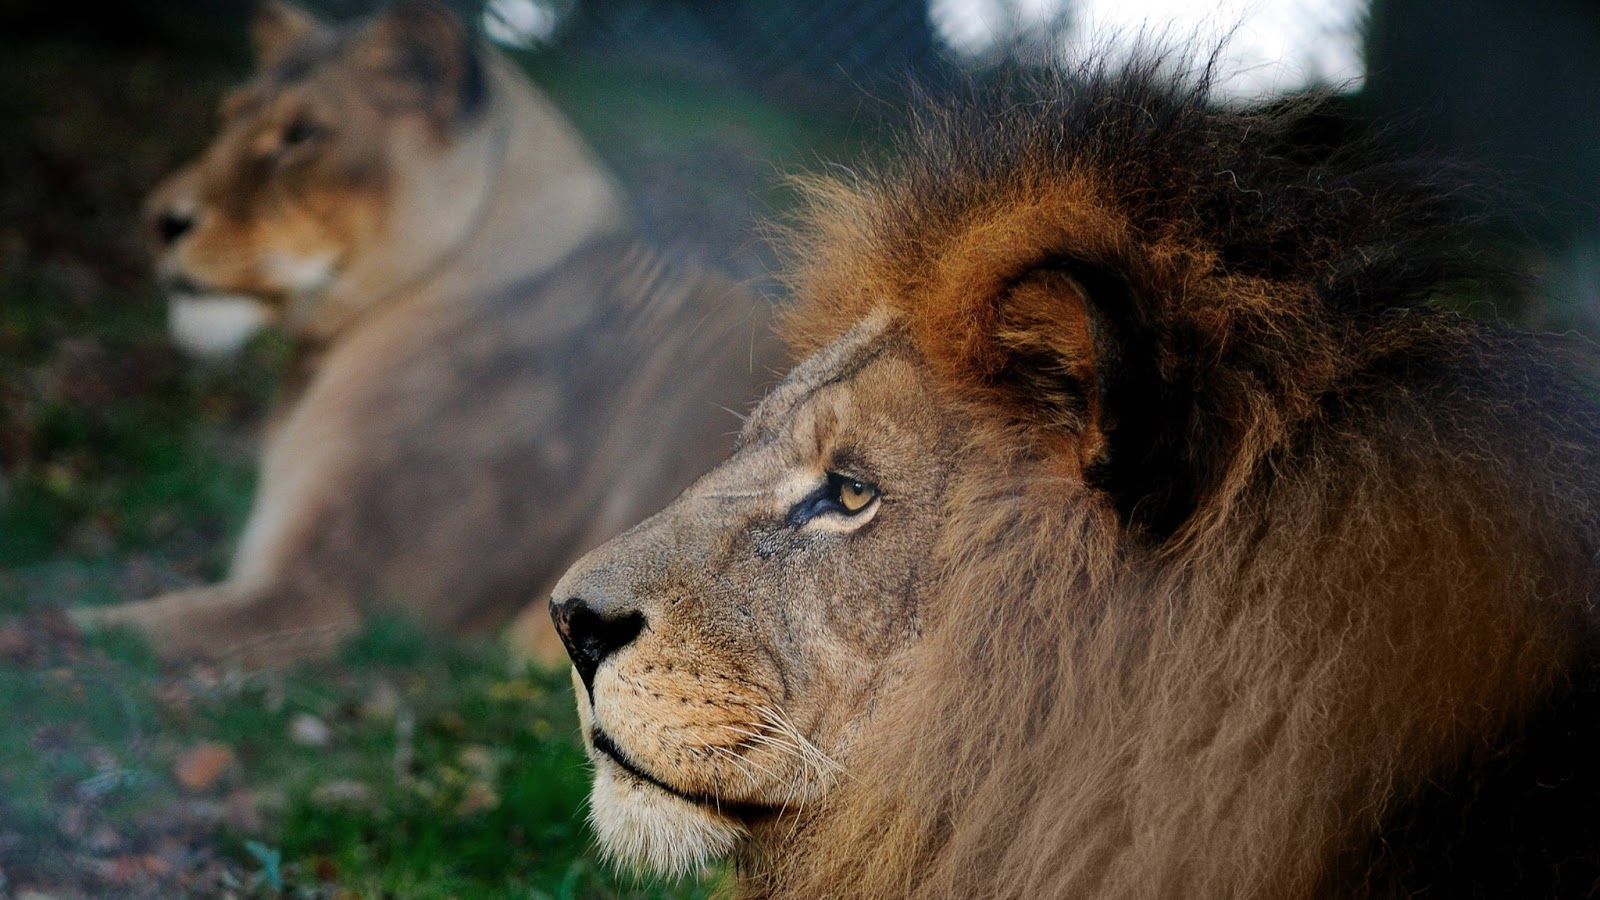 Lions wallpaper hd - photo#16